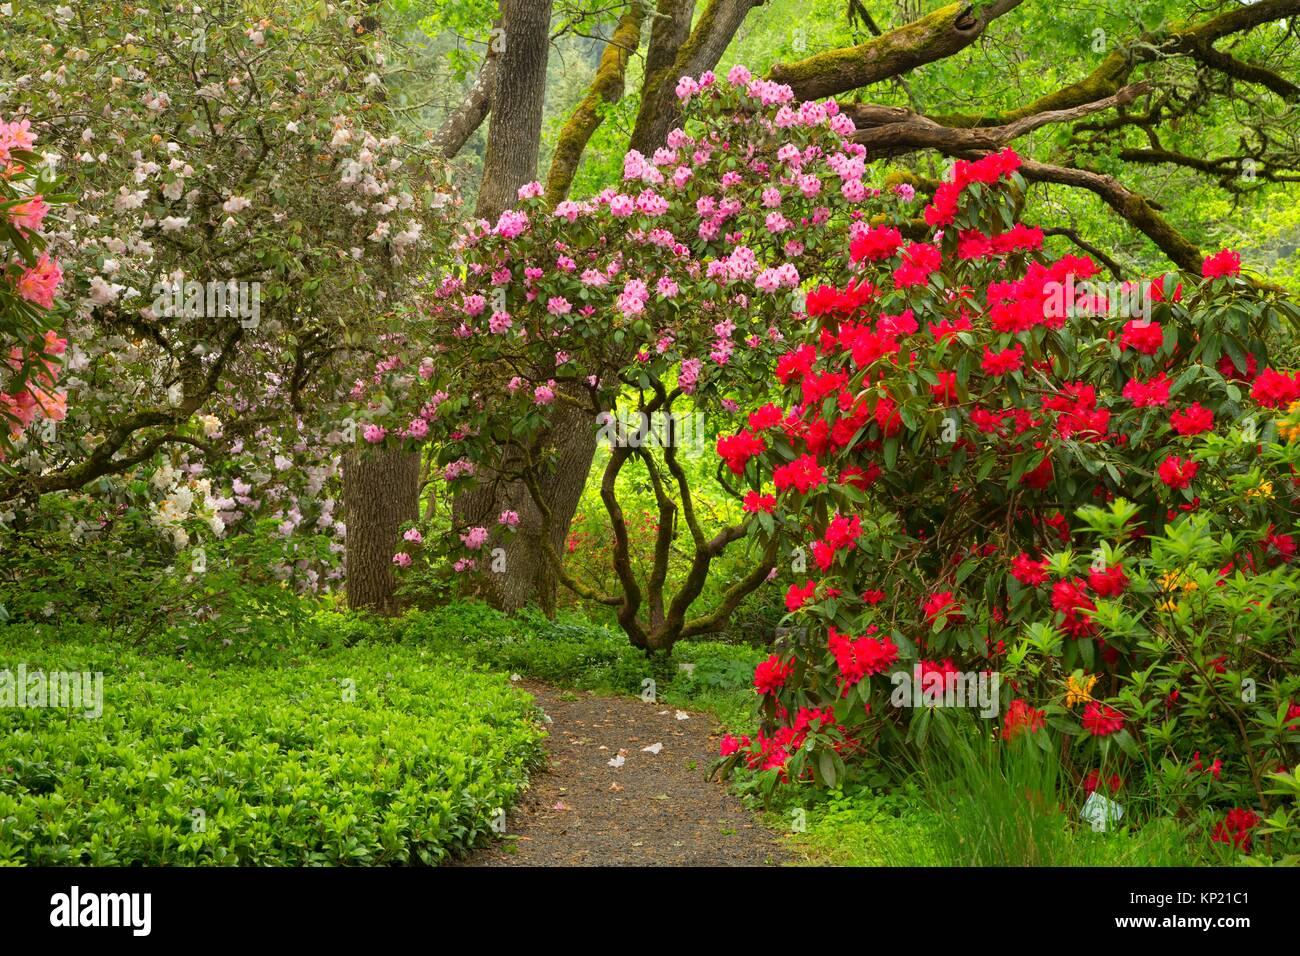 Rhododendron bloom with garden path, Rhododendron Garden, Hendricks Park, Eugene, Oregon. - Stock Image